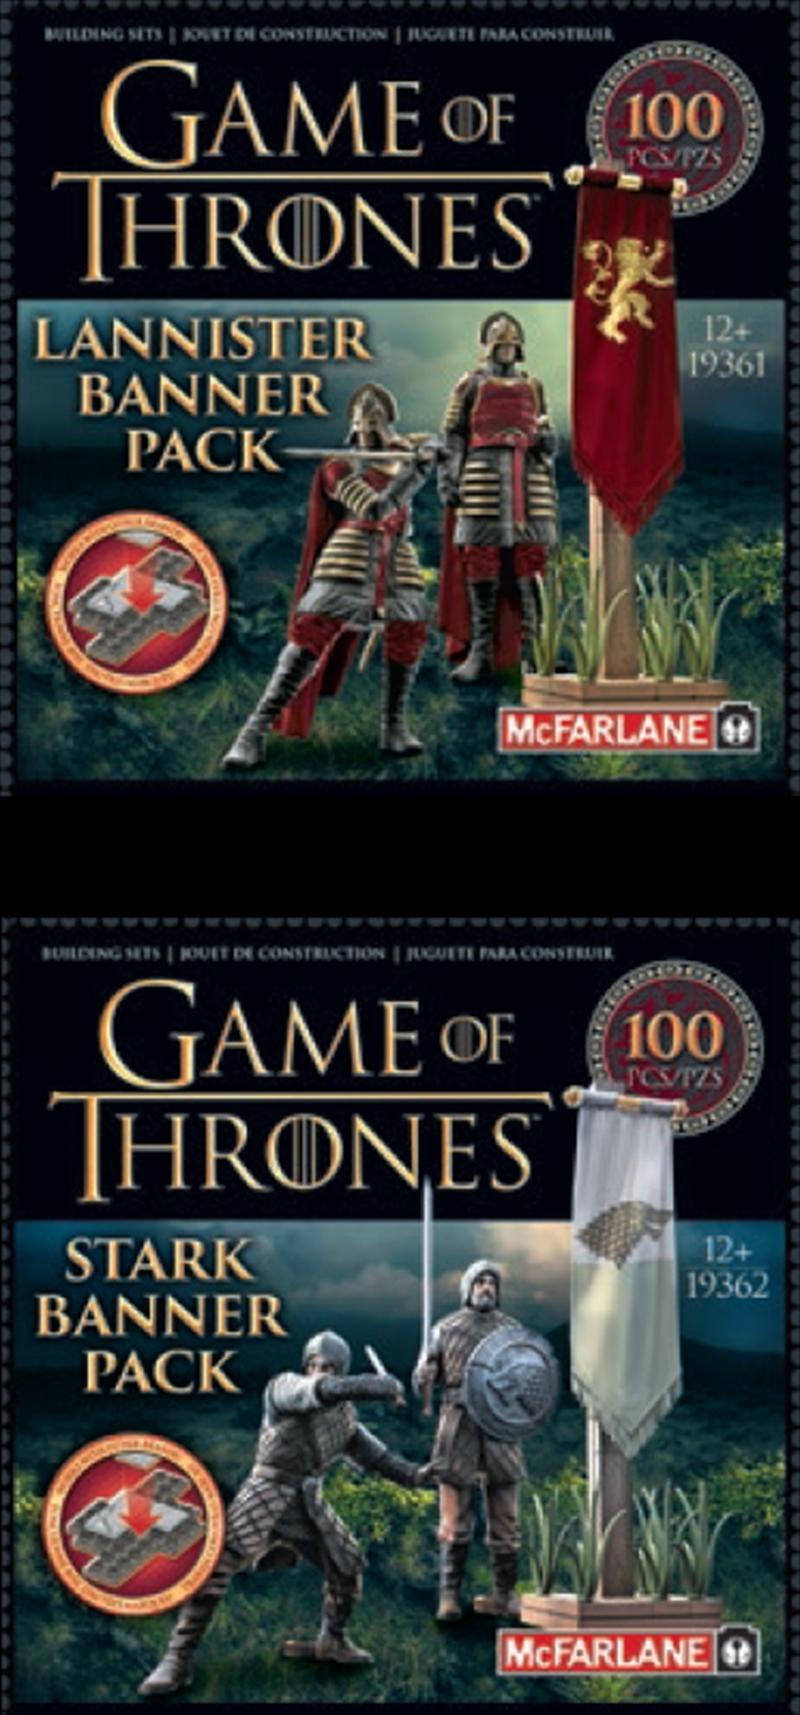 Game of Thrones - Construction Set Banner Pack Assortment (Sent At Random).   Merchandise